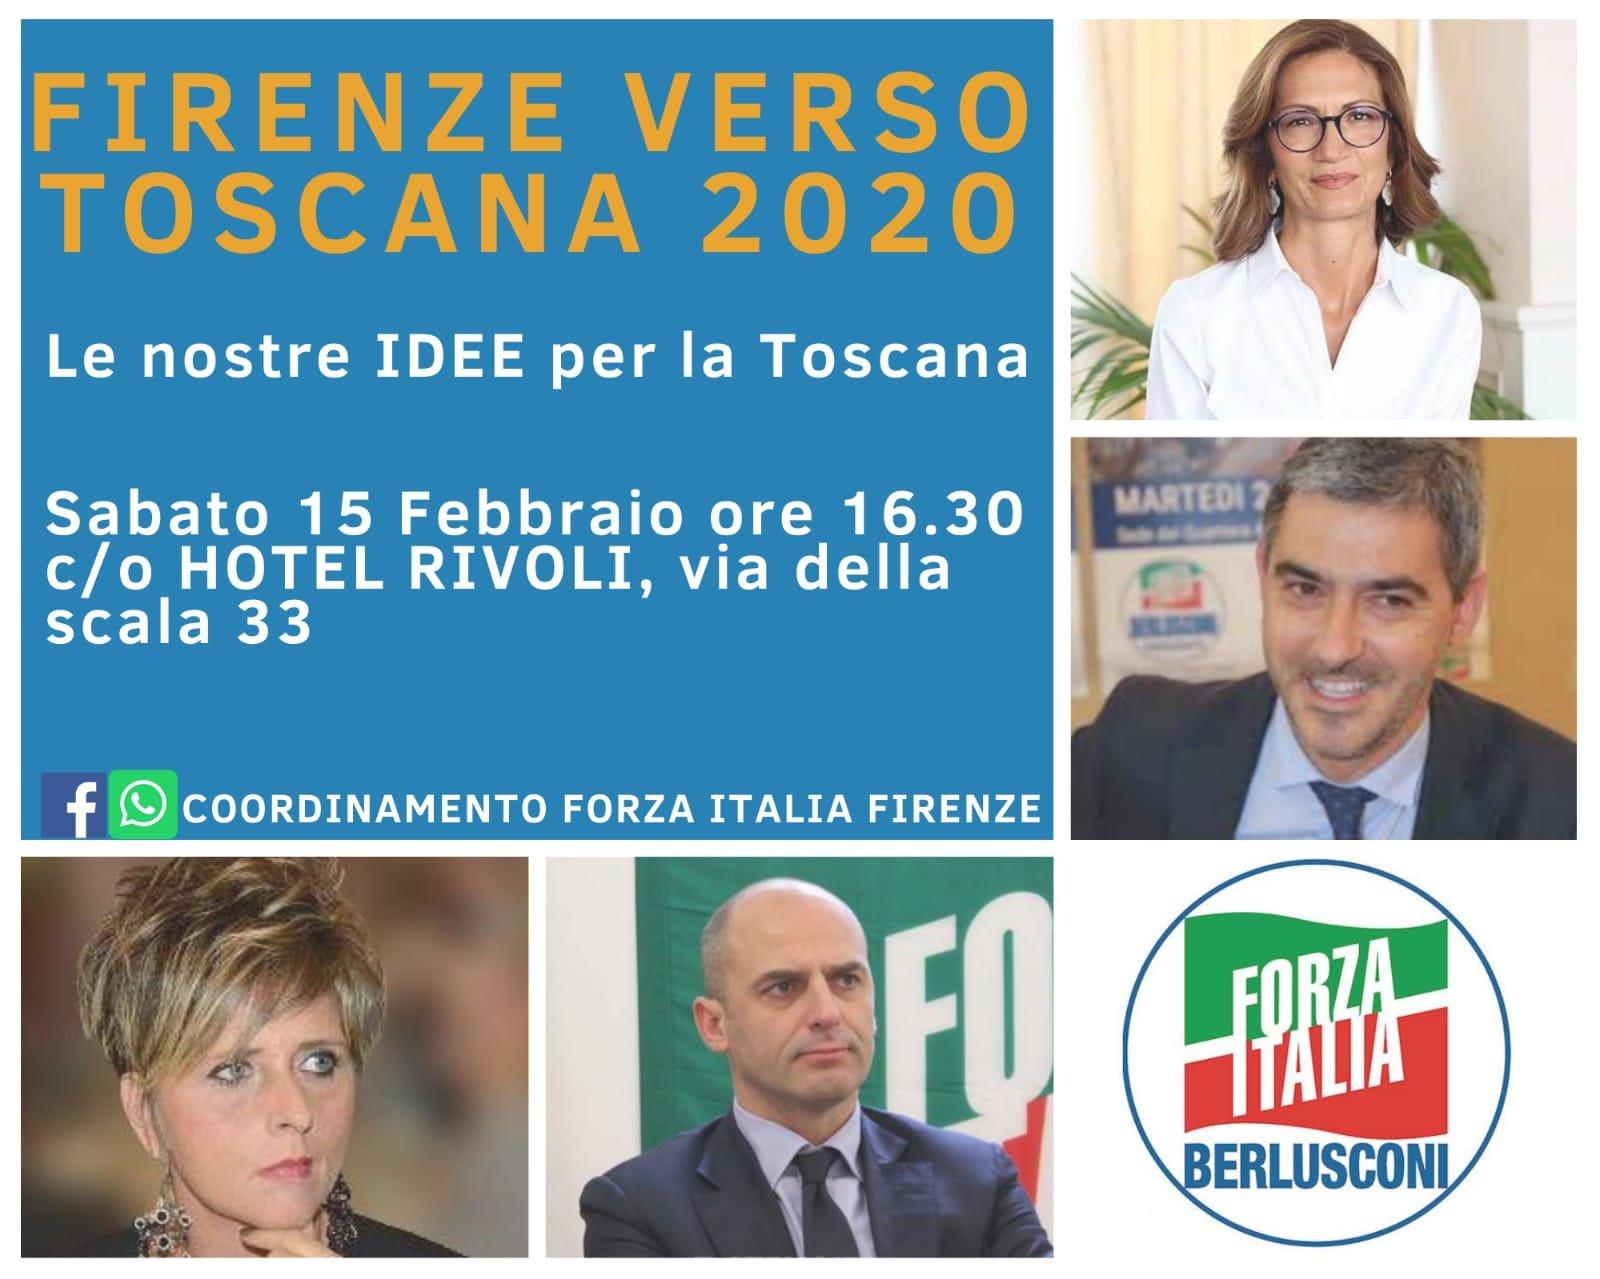 Firenze verso Toscana 2020 - locandina